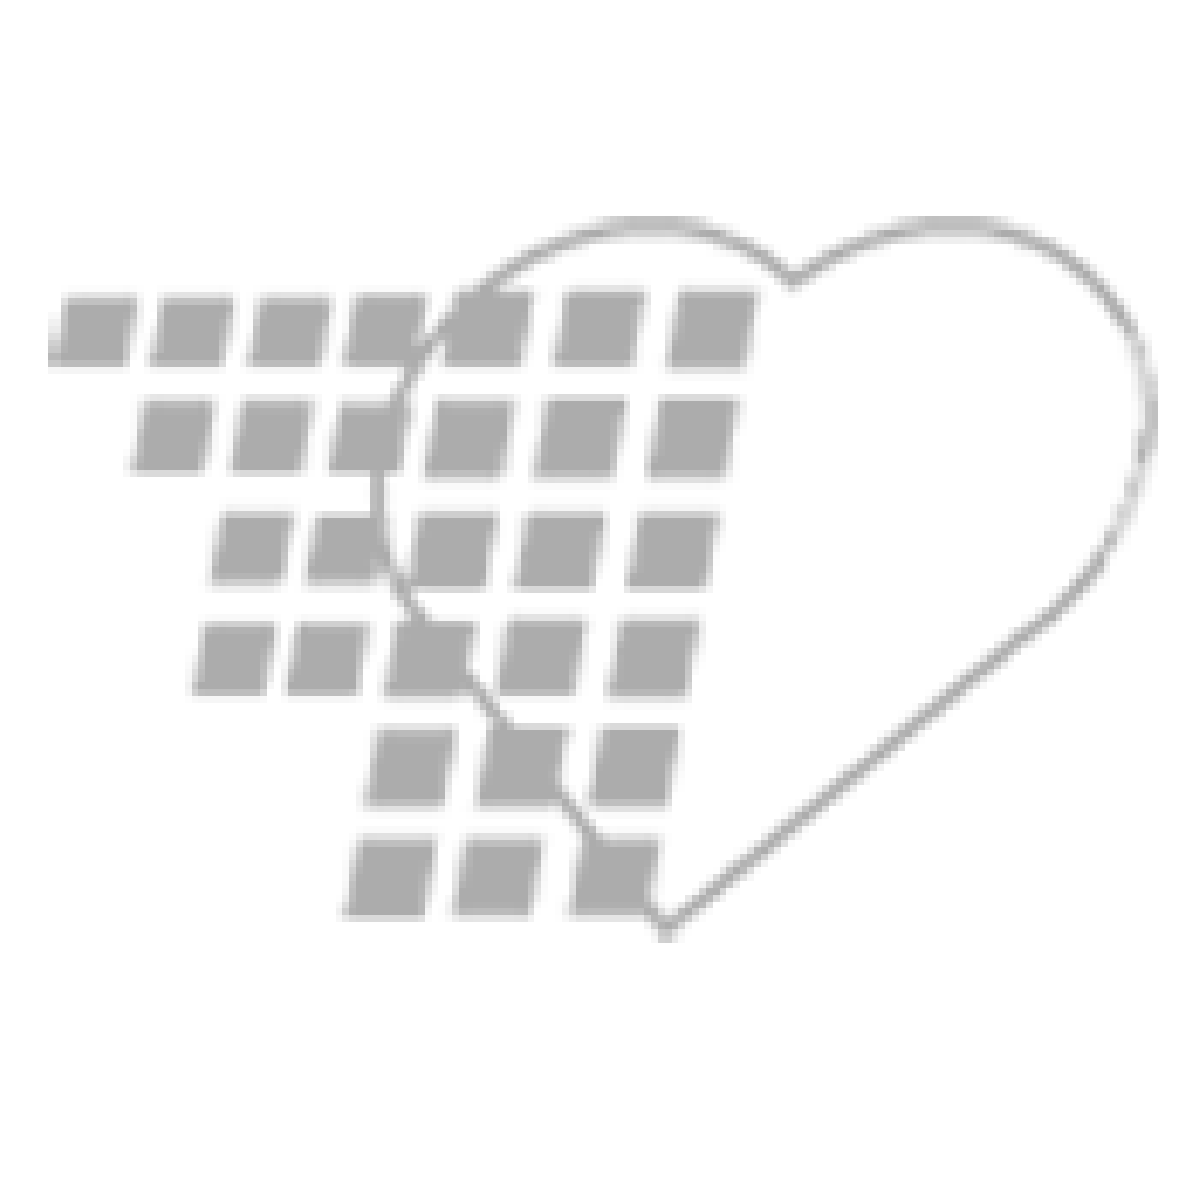 06-93-0718 Demo Dose® Benazeprl (Lotensn) 20mg - 100 Pills/Box